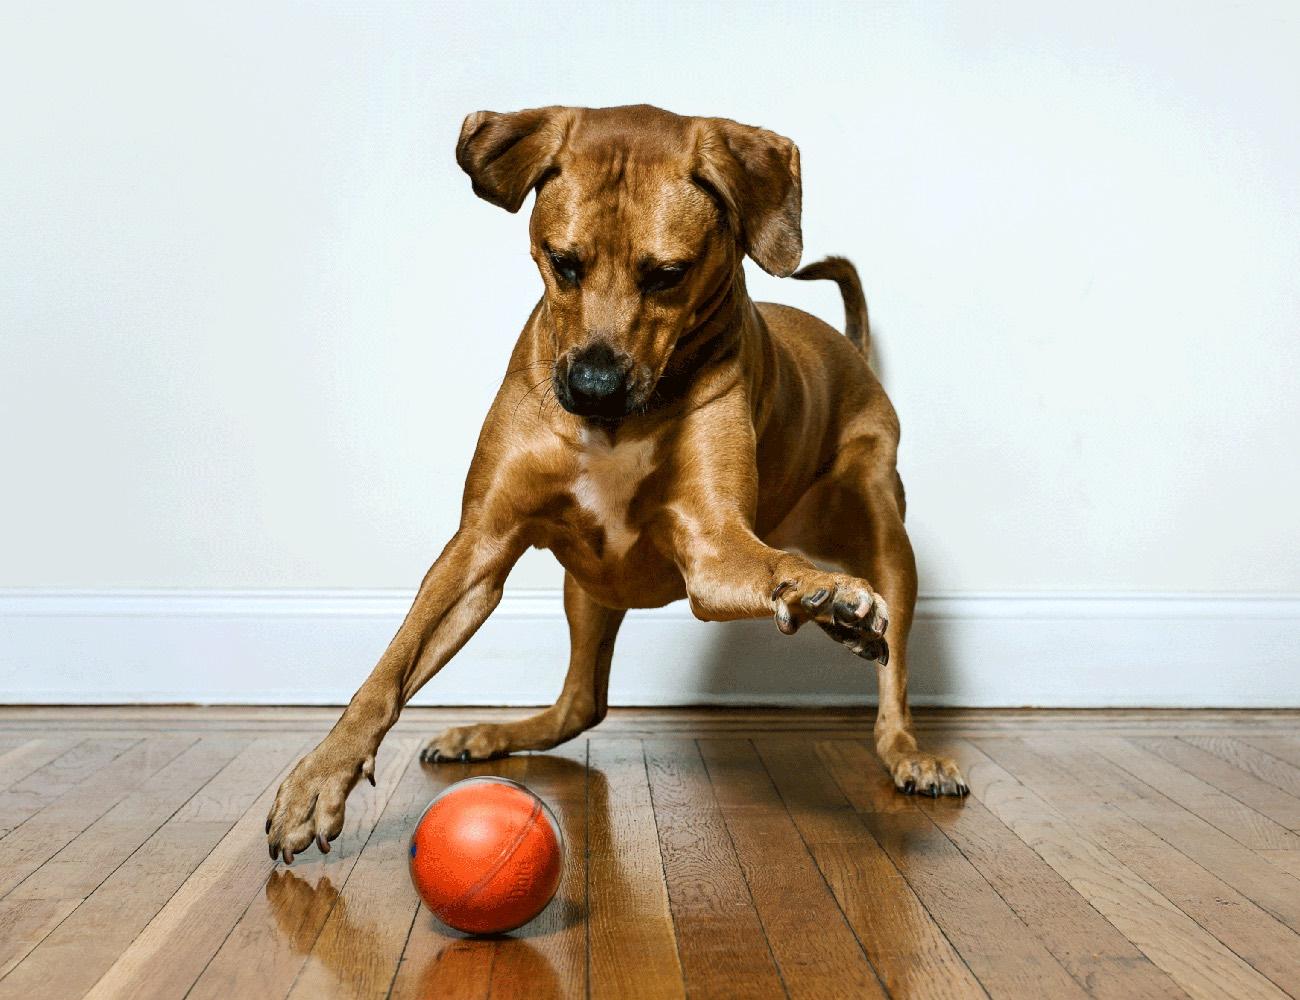 PlayDate – World's First Pet Camera in a Smart Ball